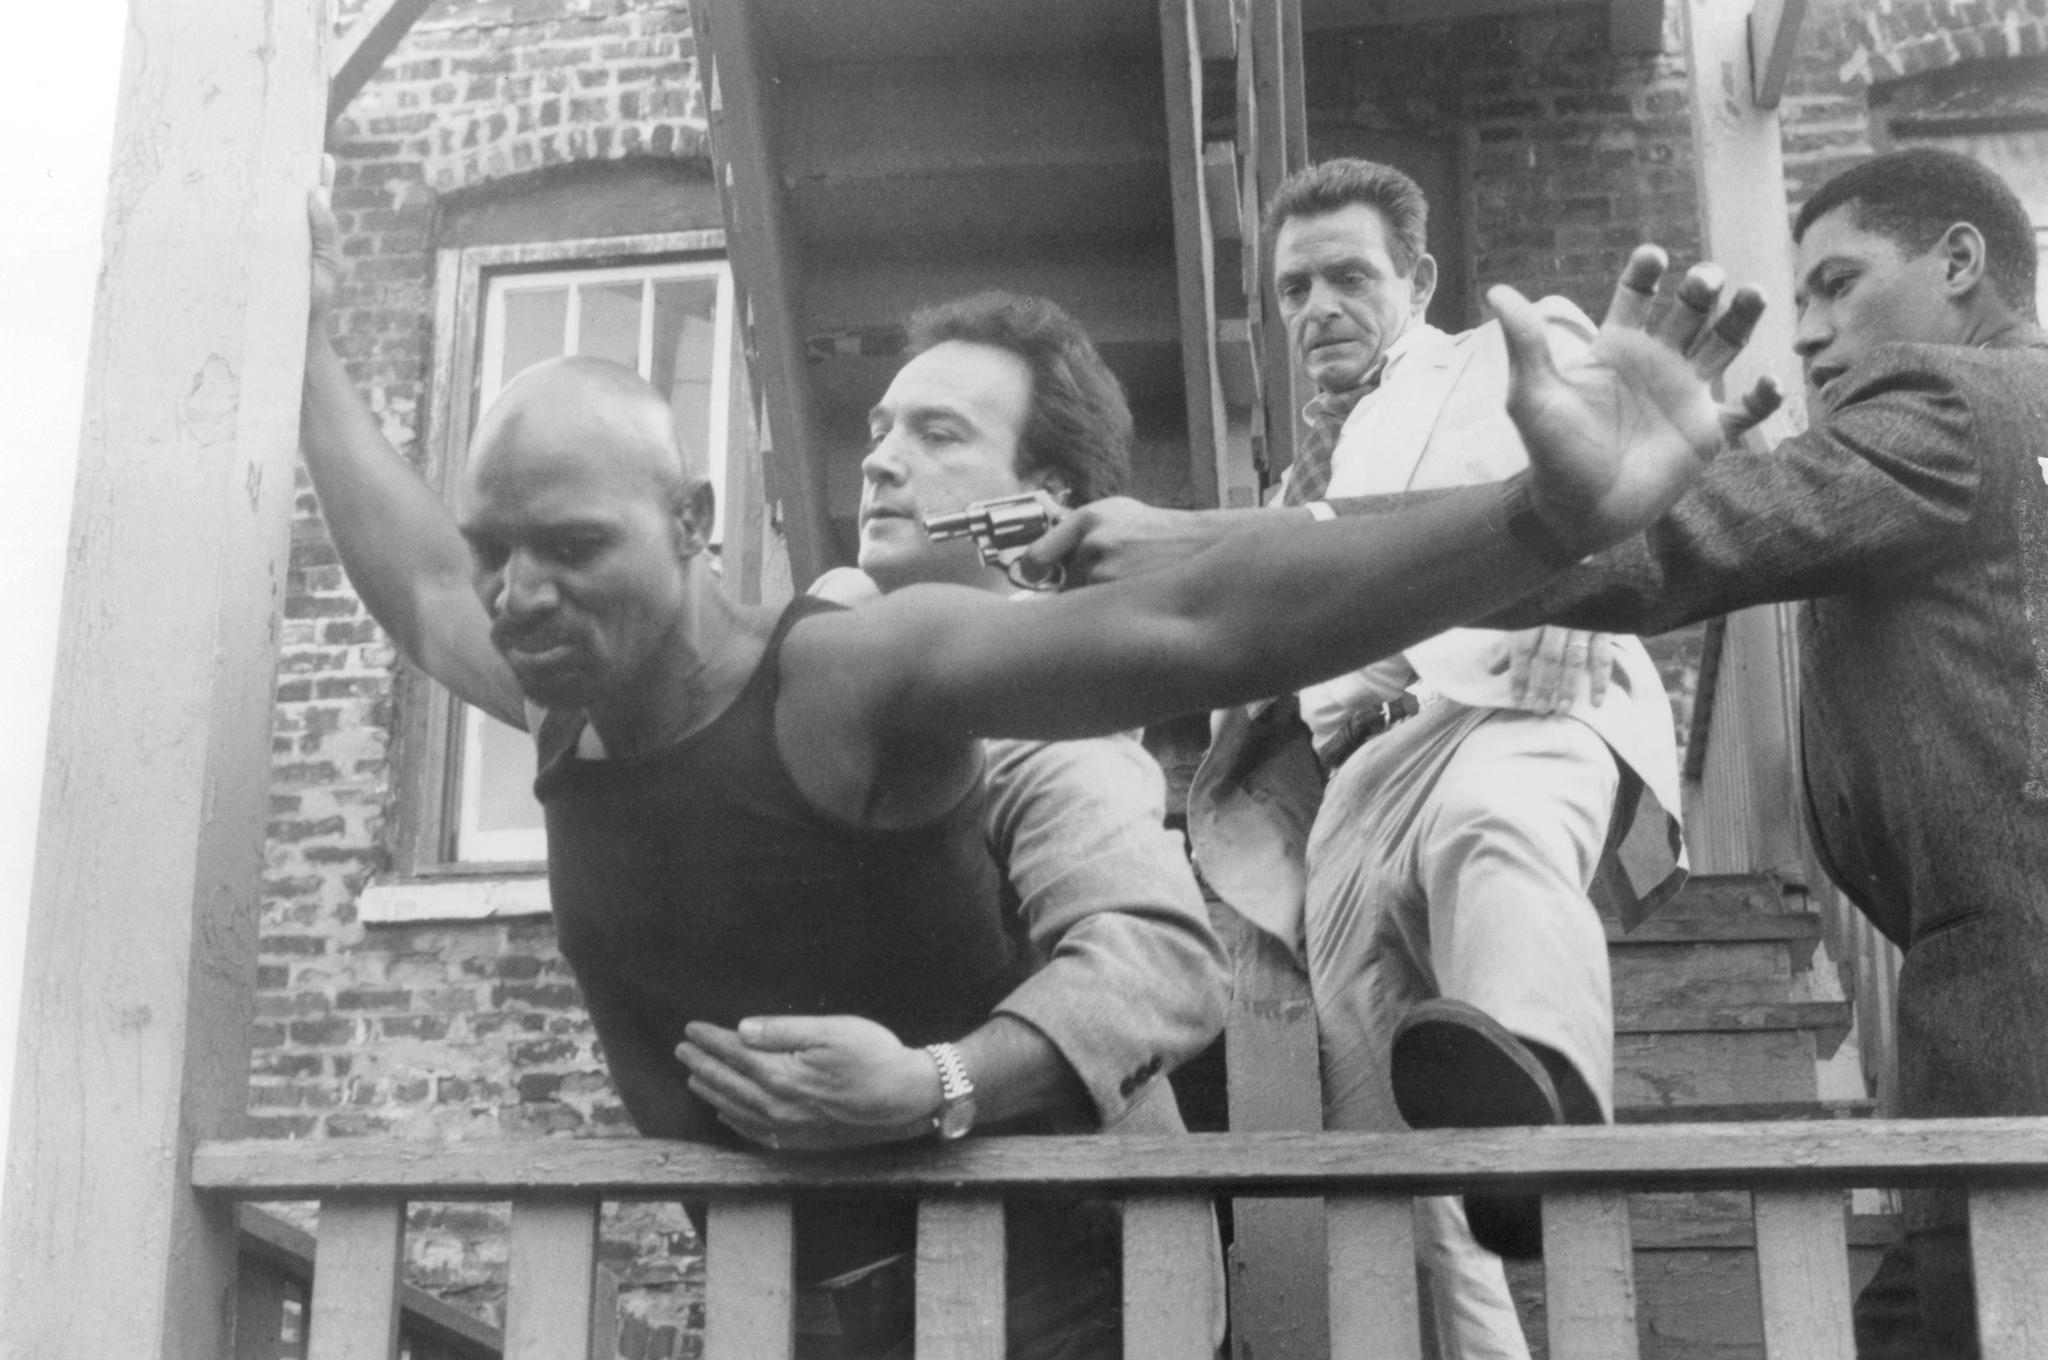 Laurence Fishburne, Jim Belushi, Richard Bright, and Eric Mansker in Red Heat (1988)